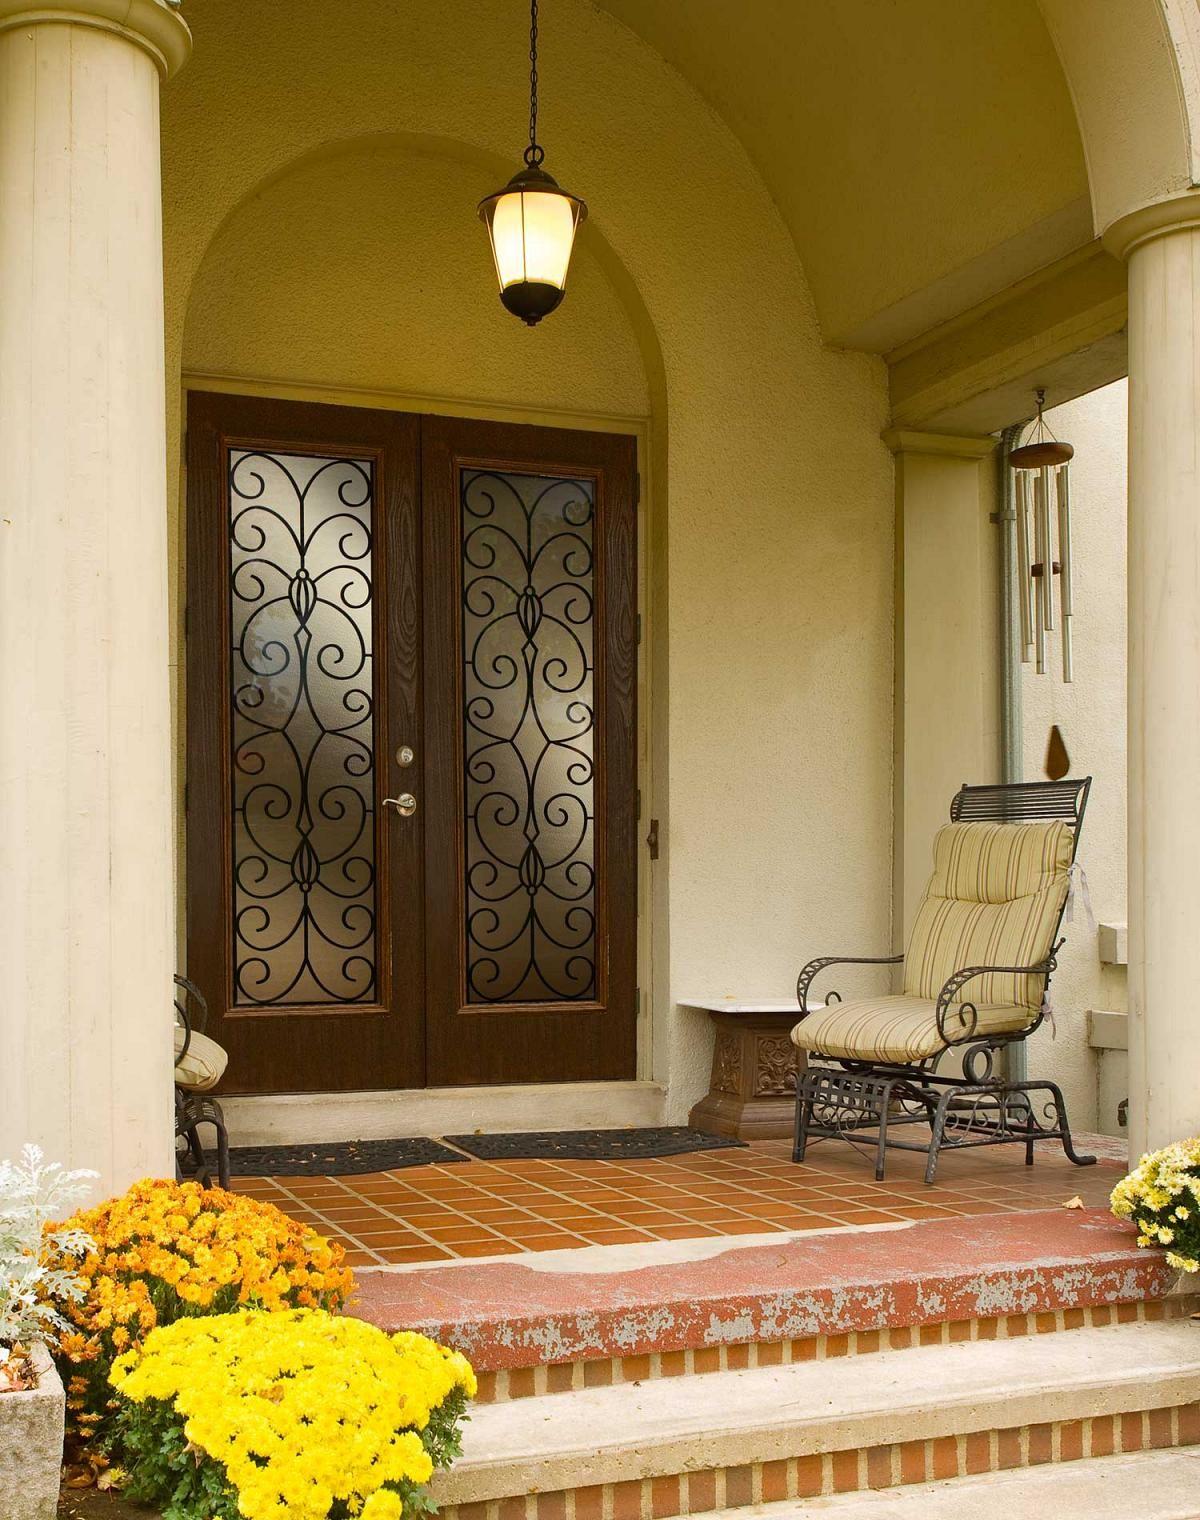 Odl Catalina Decorative Door Glass Barbie Dream House Pinterest